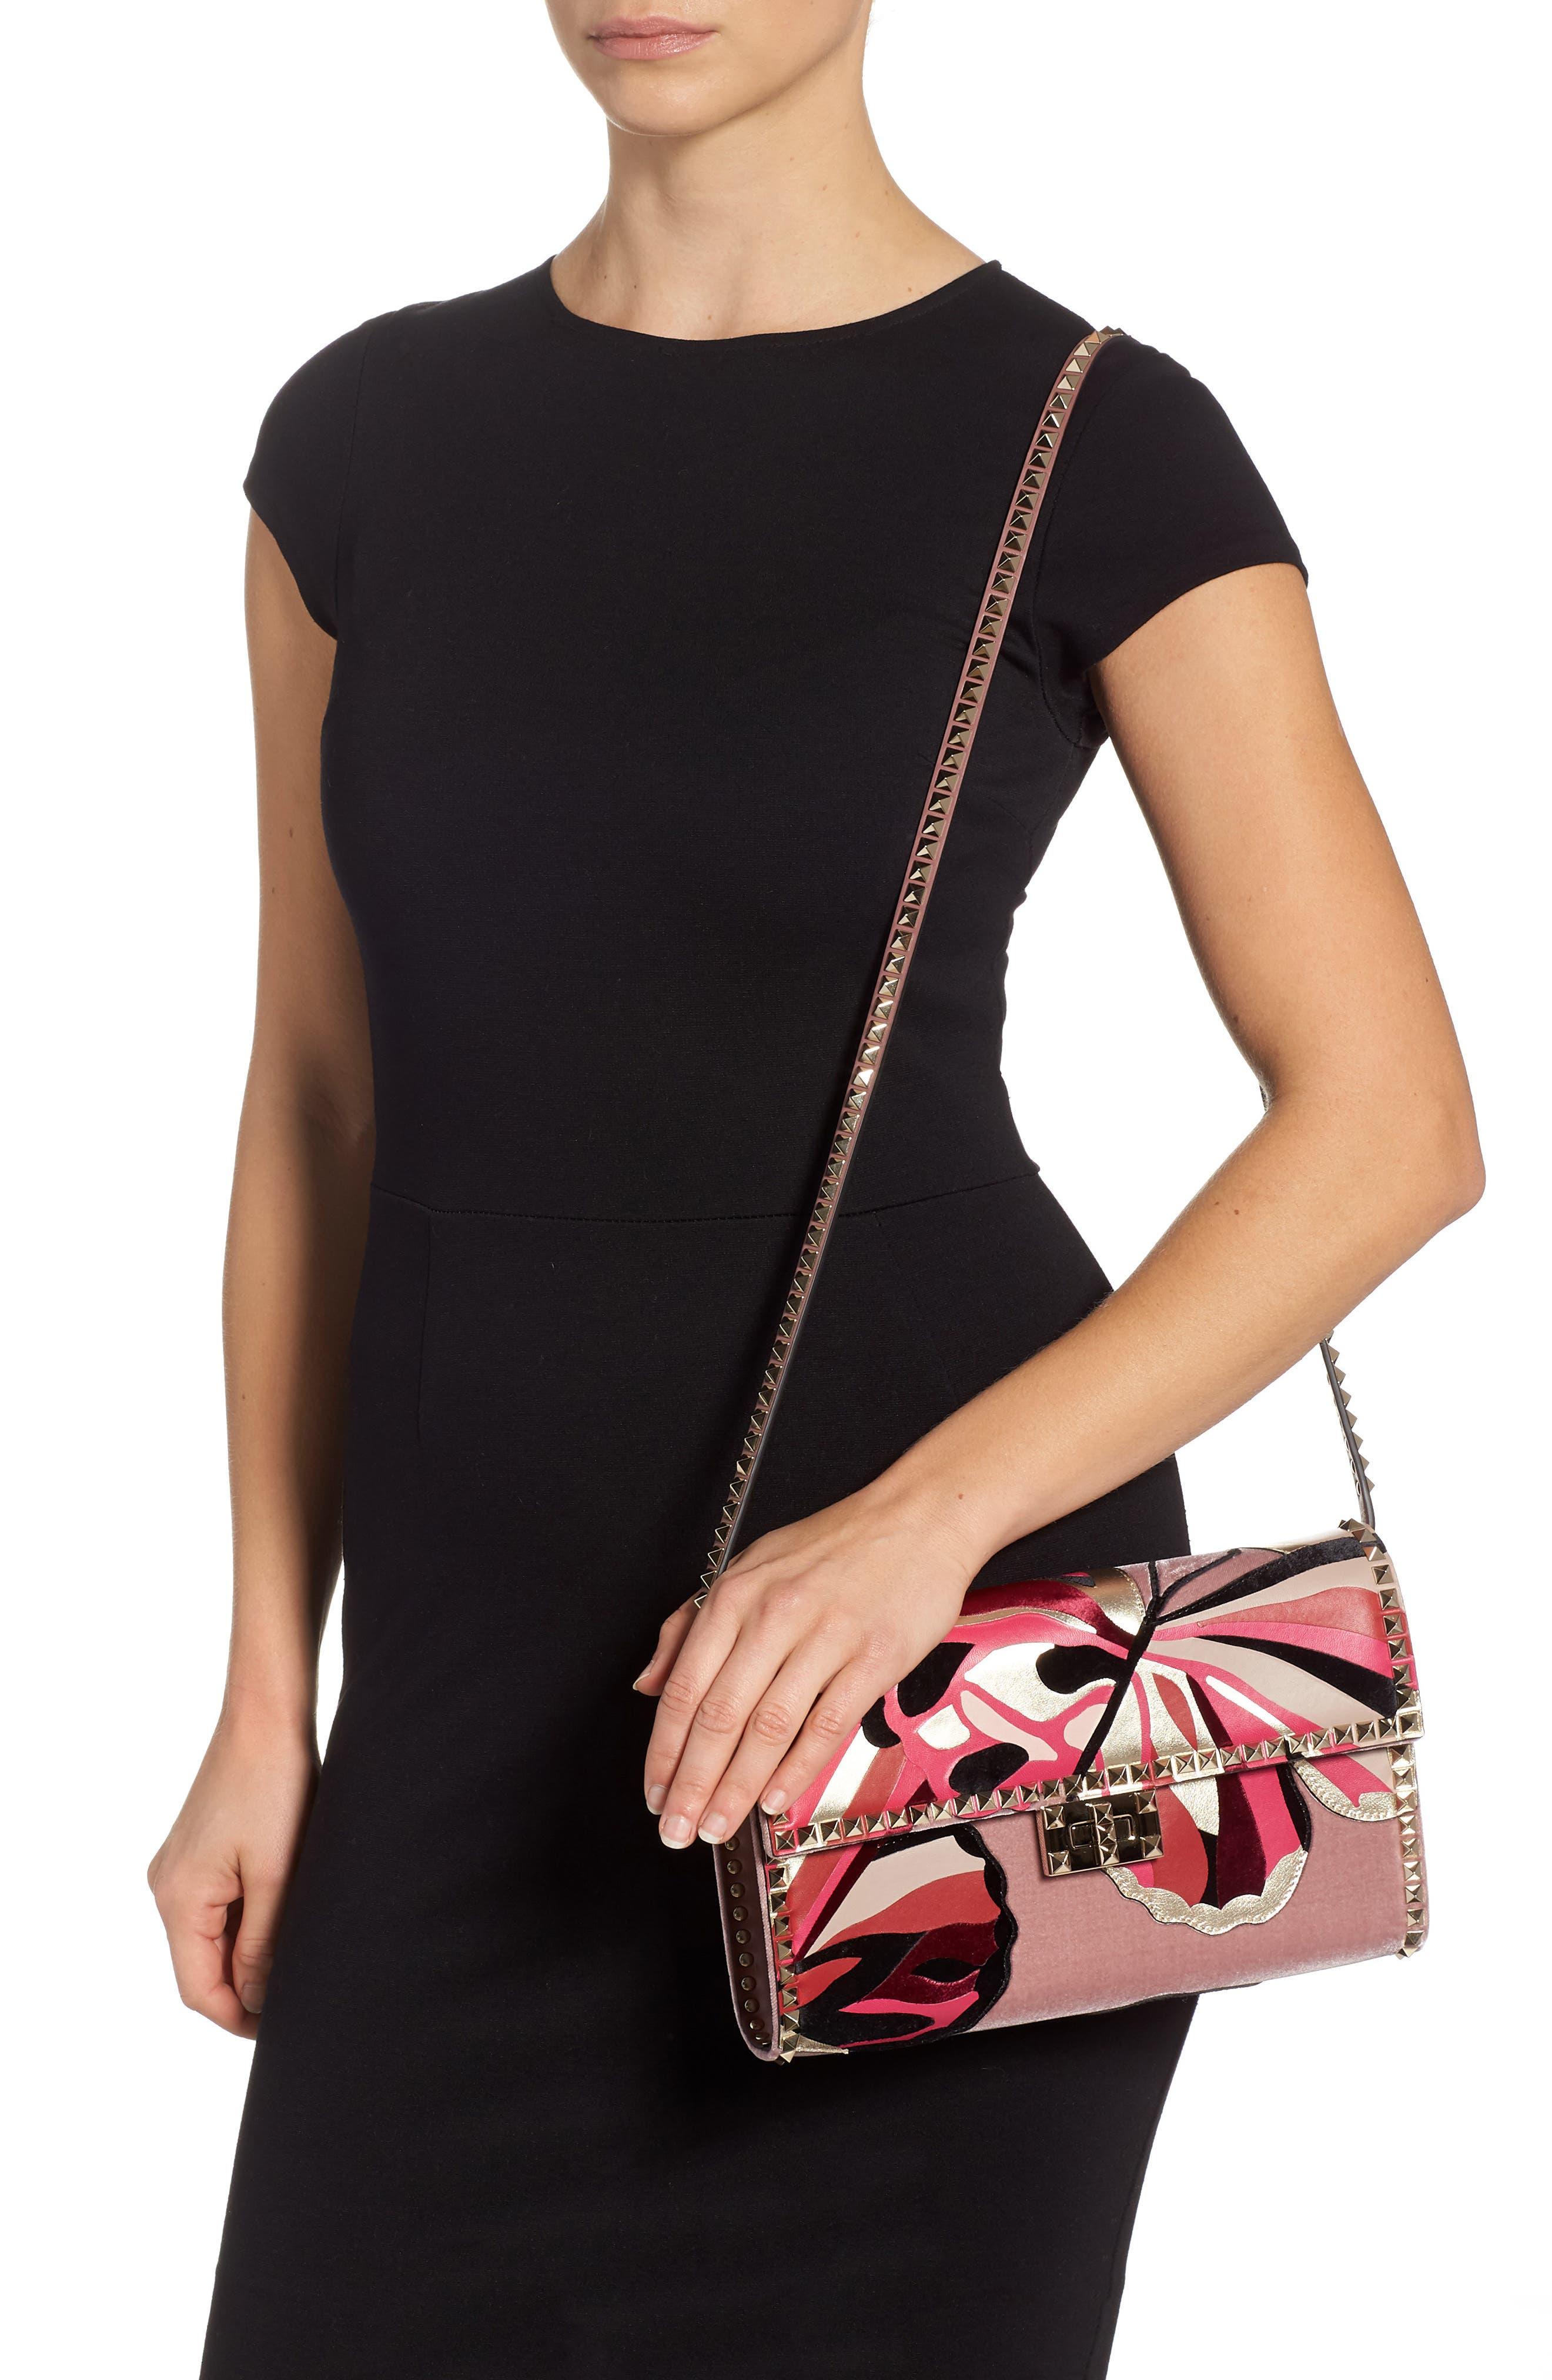 VALENTINO GARAVANI,                             Patchwork Butterfly Leather & Textile Shoulder Bag,                             Alternate thumbnail 2, color,                             LIP